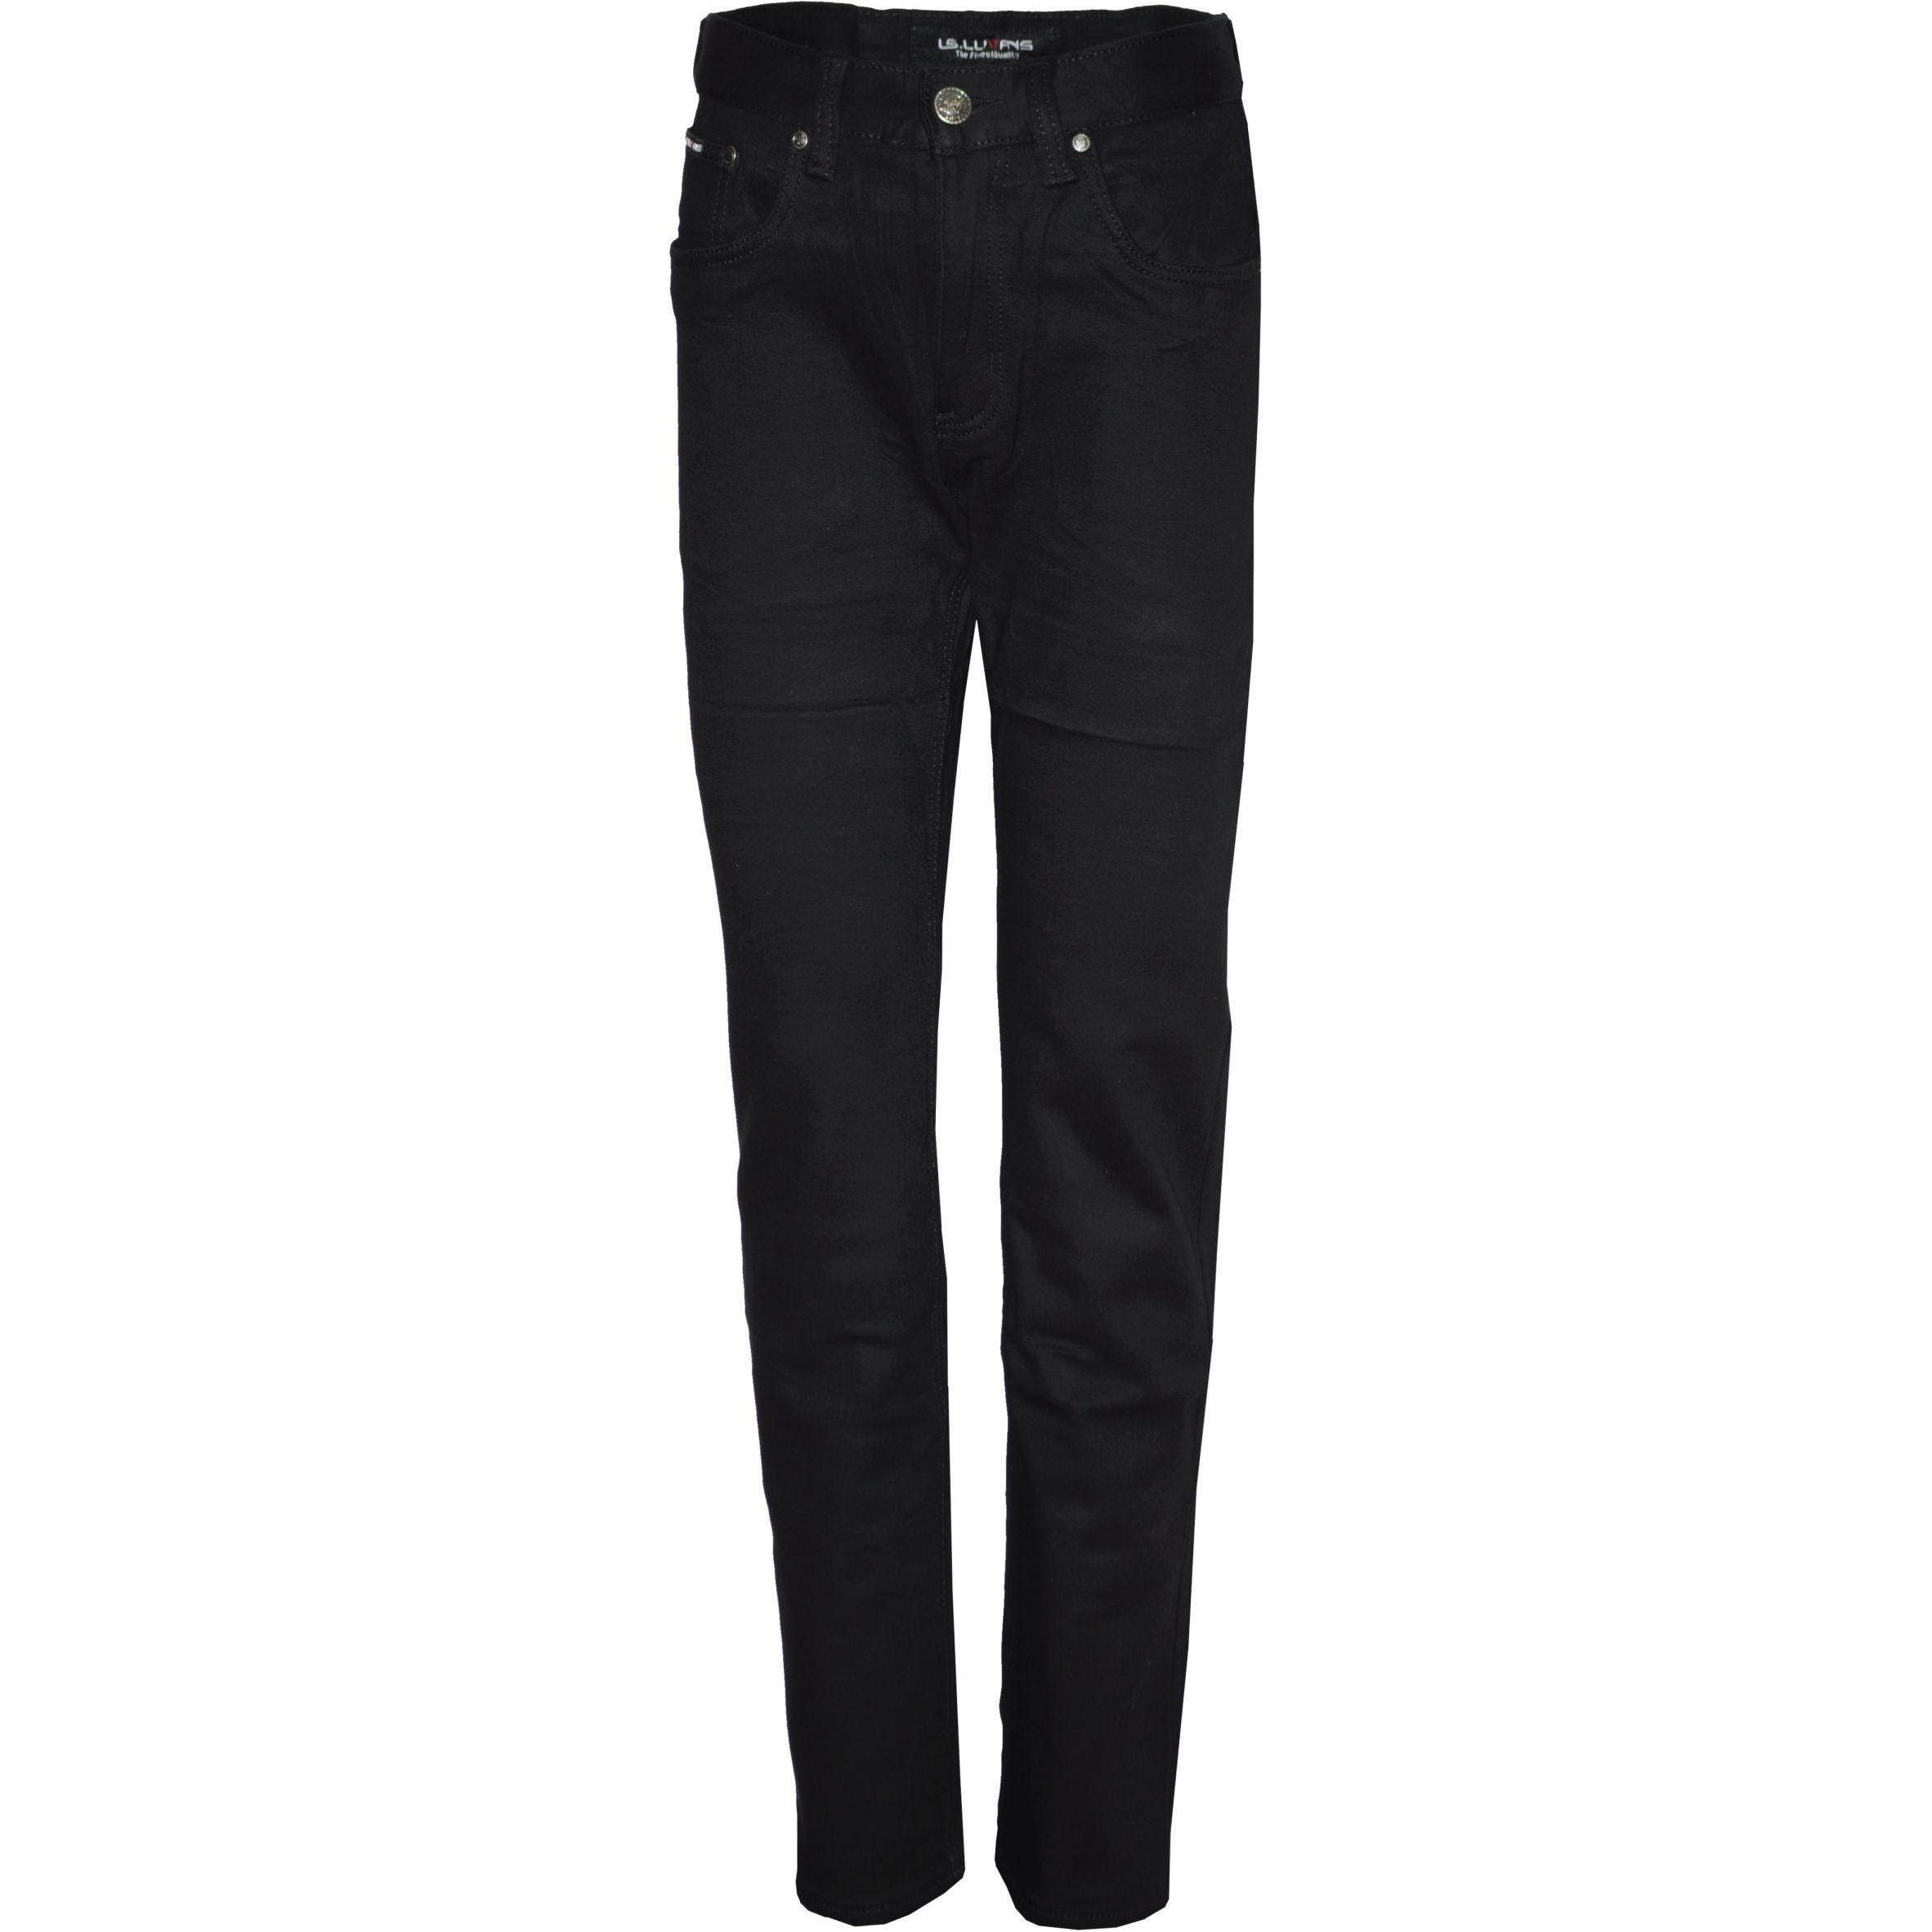 3cfff5fb1c Nadrág LS Jeans 8330 Bélelt sztreccs twill (Jeans Edition)